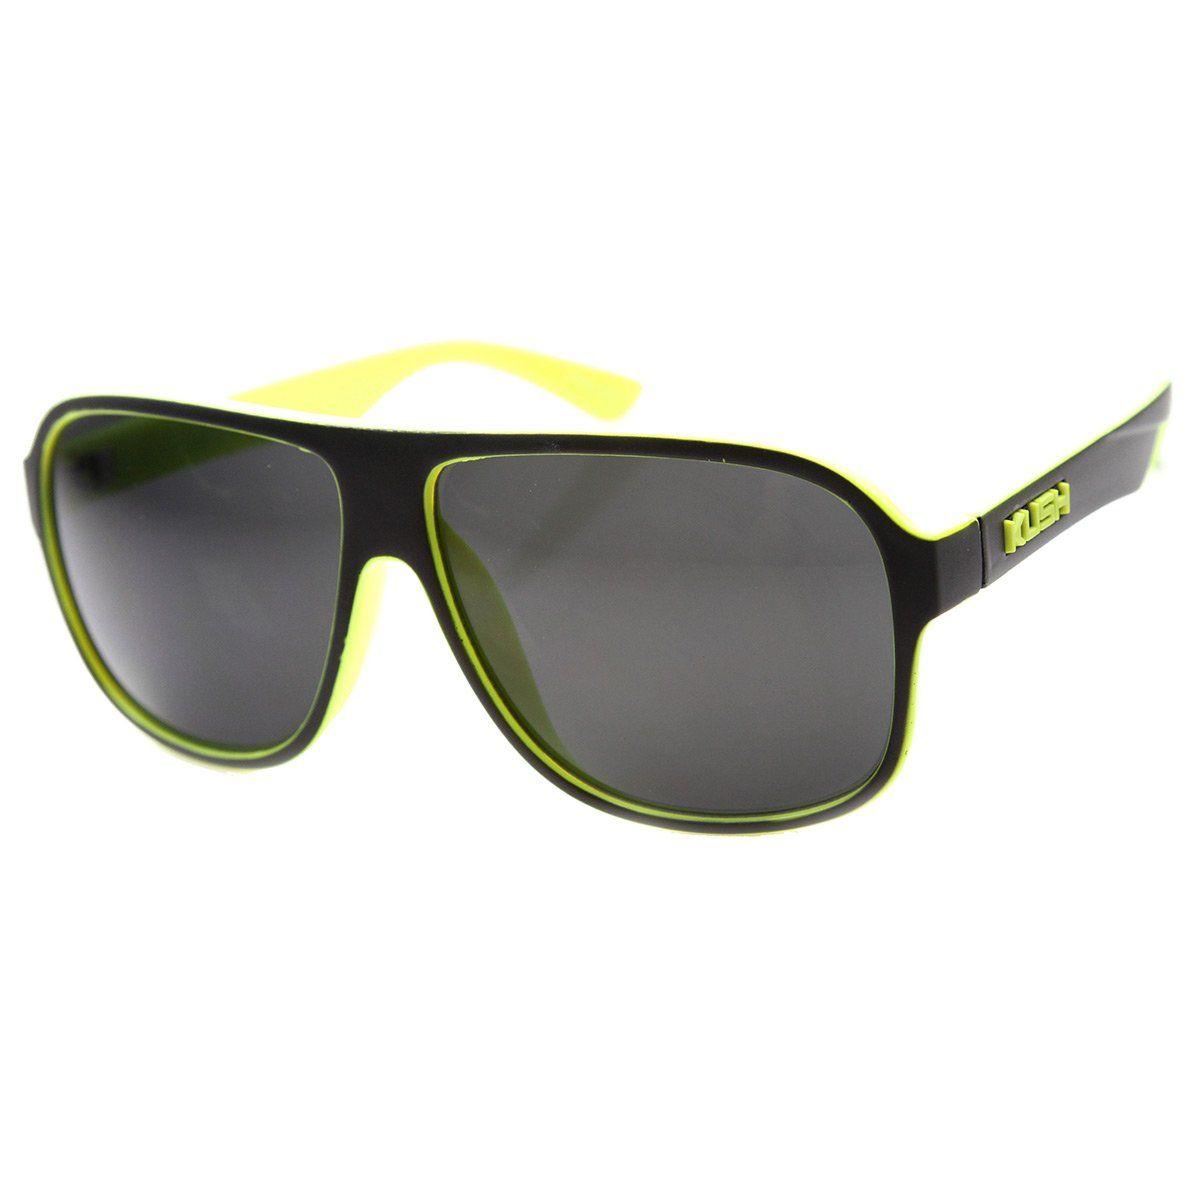 76f24b590a Mens Flat Top Plastic Neon Two-Toned Aviator Sunglasses